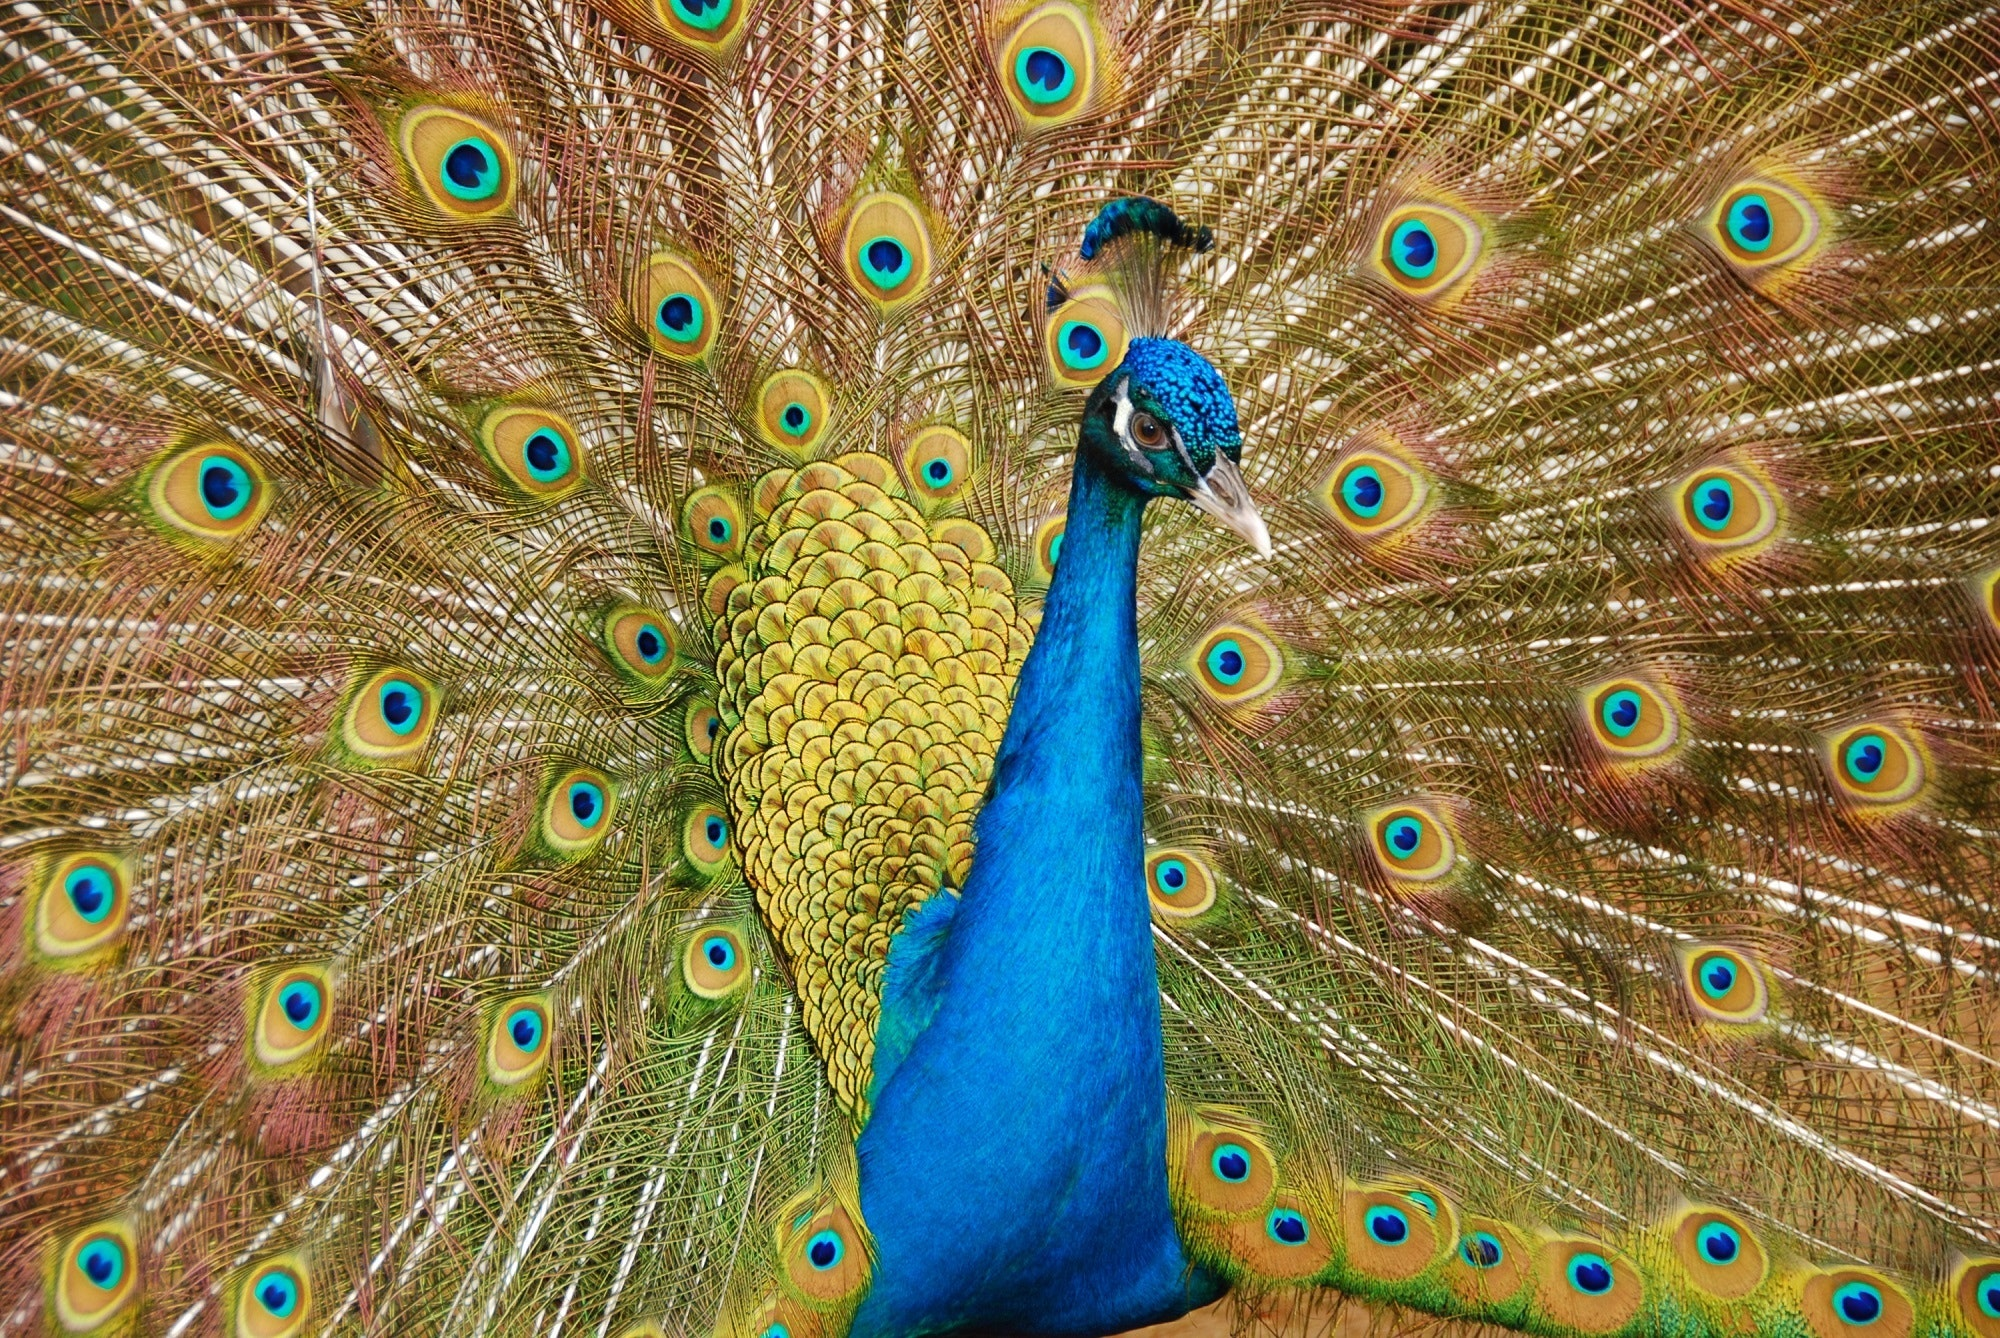 Male peafowl spreading tail photo